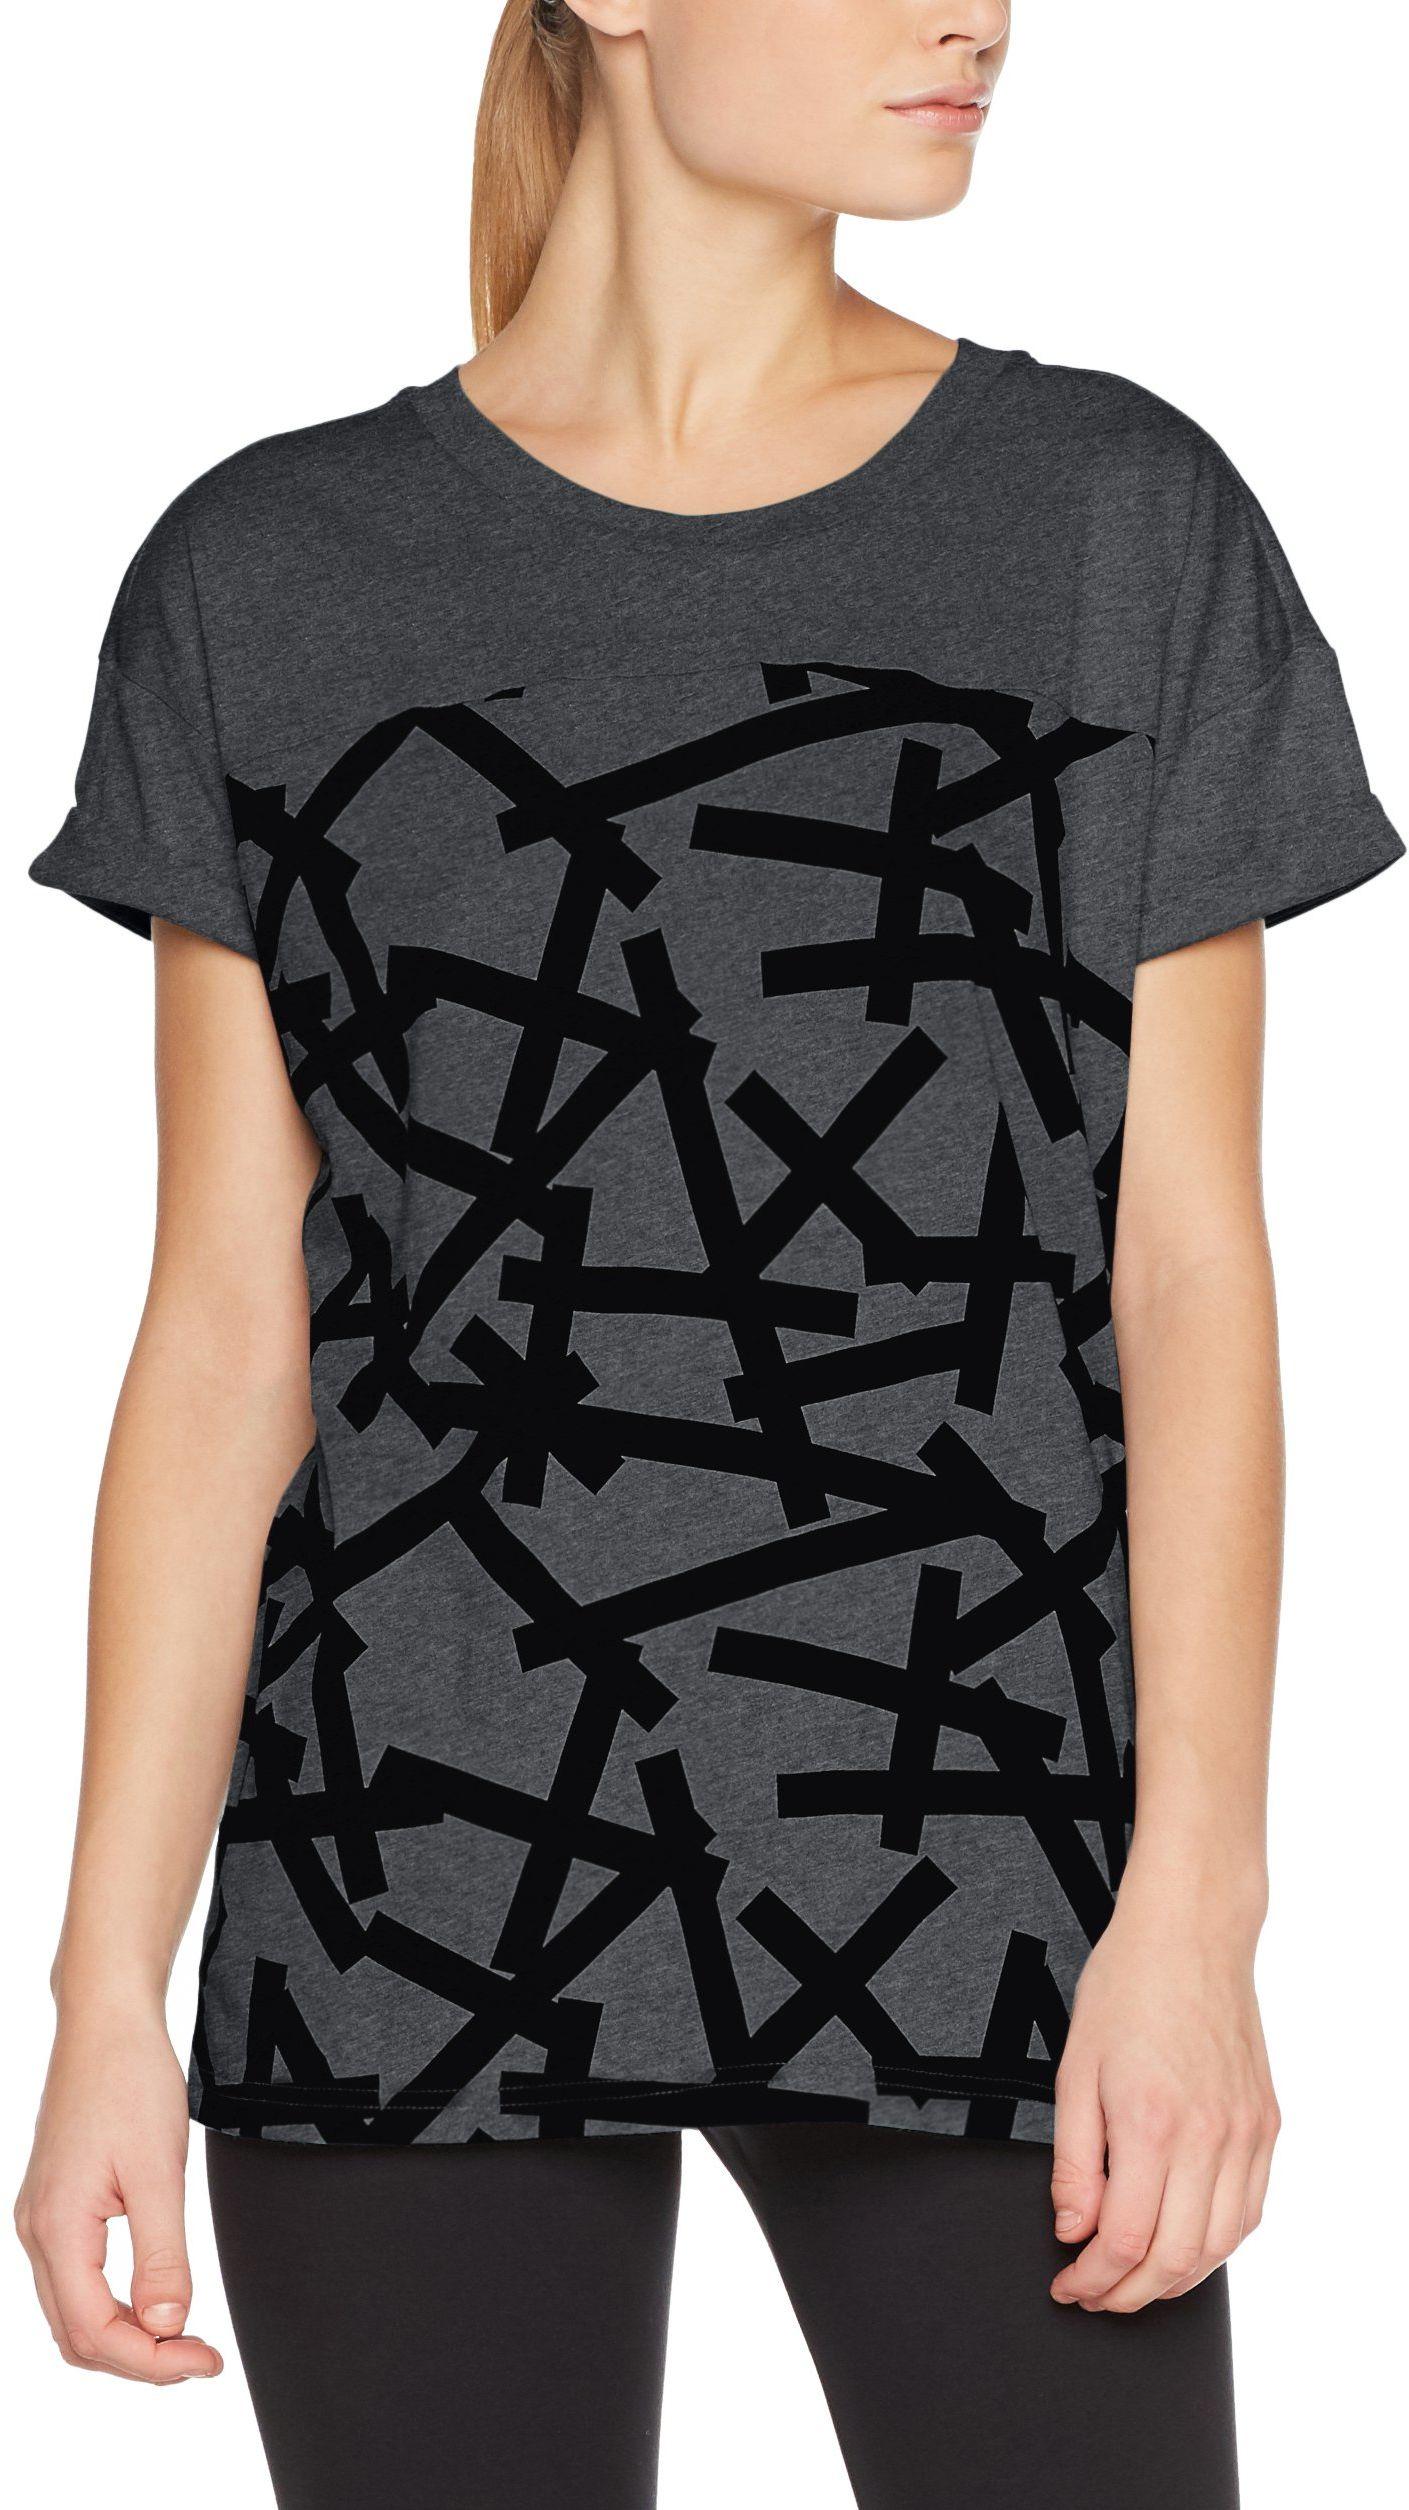 Adidas AOP TEE BLACK - XL